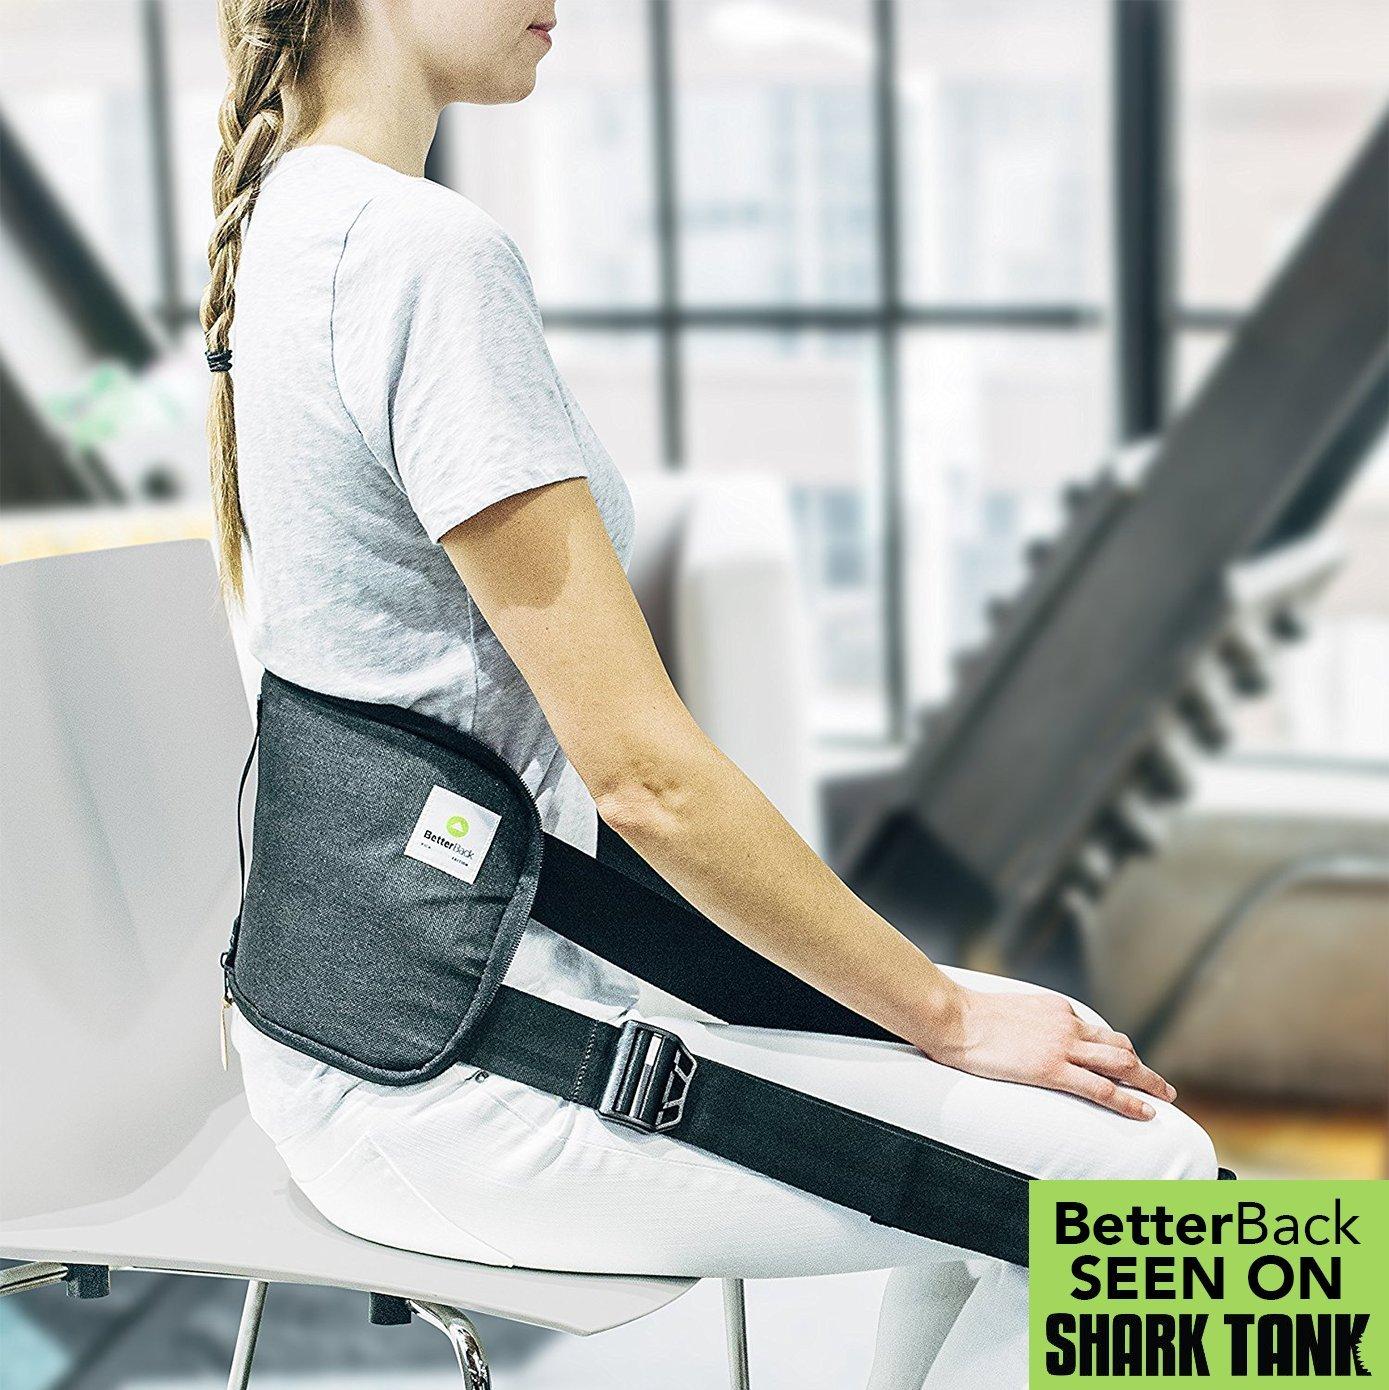 BetterBack: Good Posture Just Got So Simple